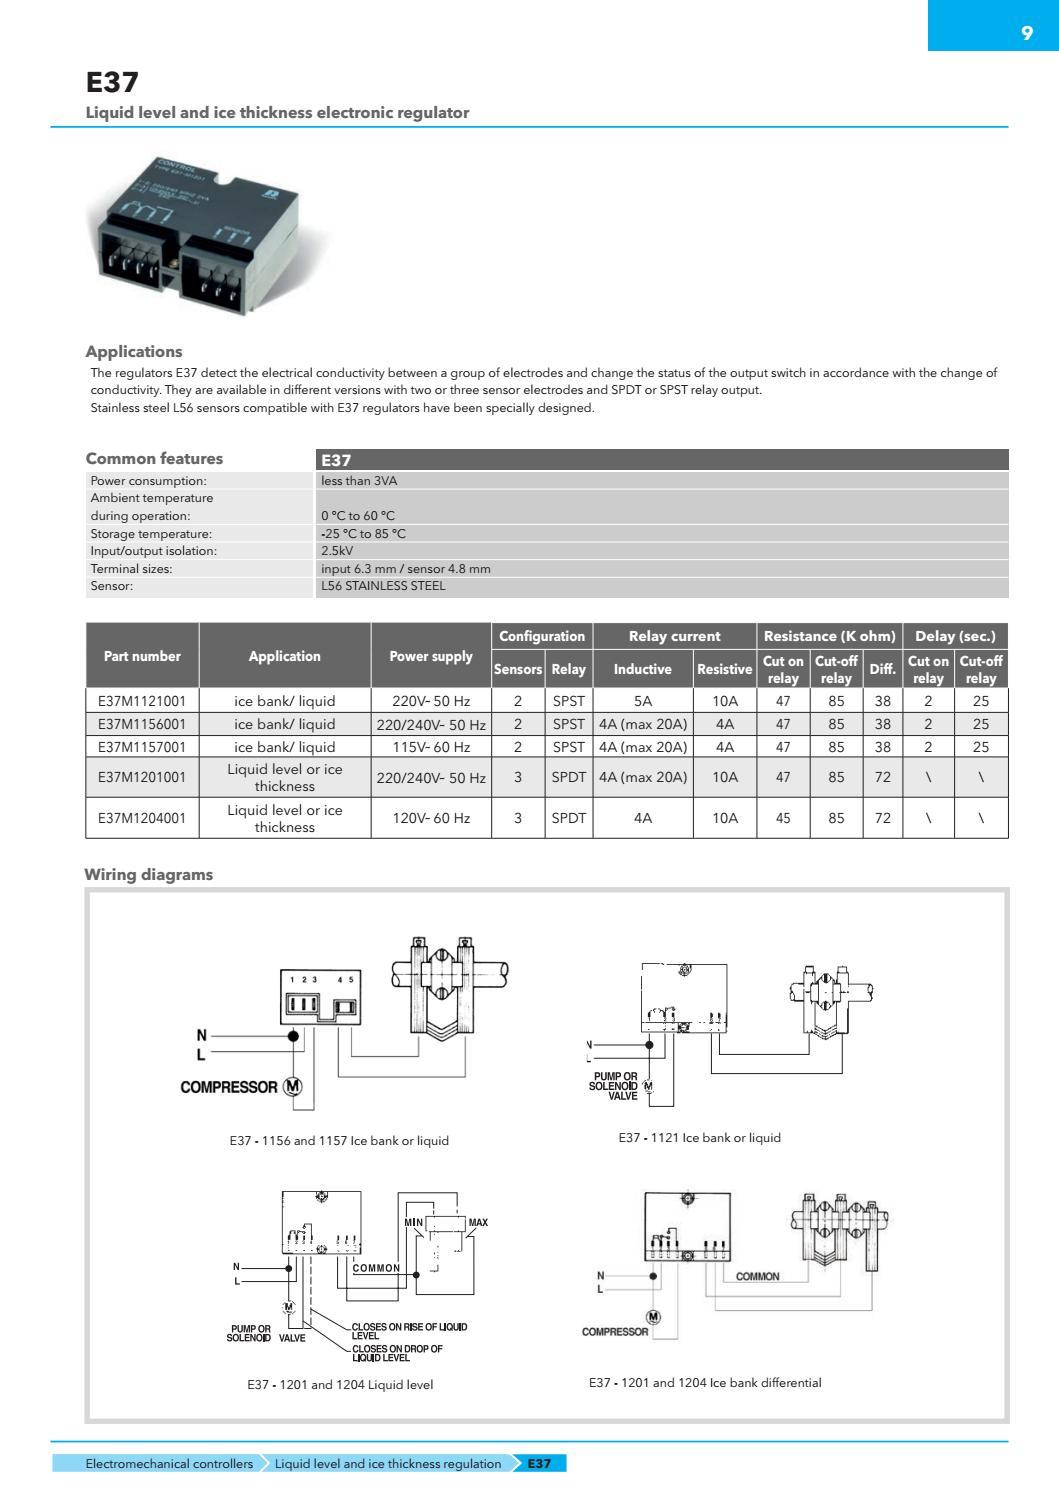 Ranco Wiring Diagram 240v - Wiring Diagrams List on